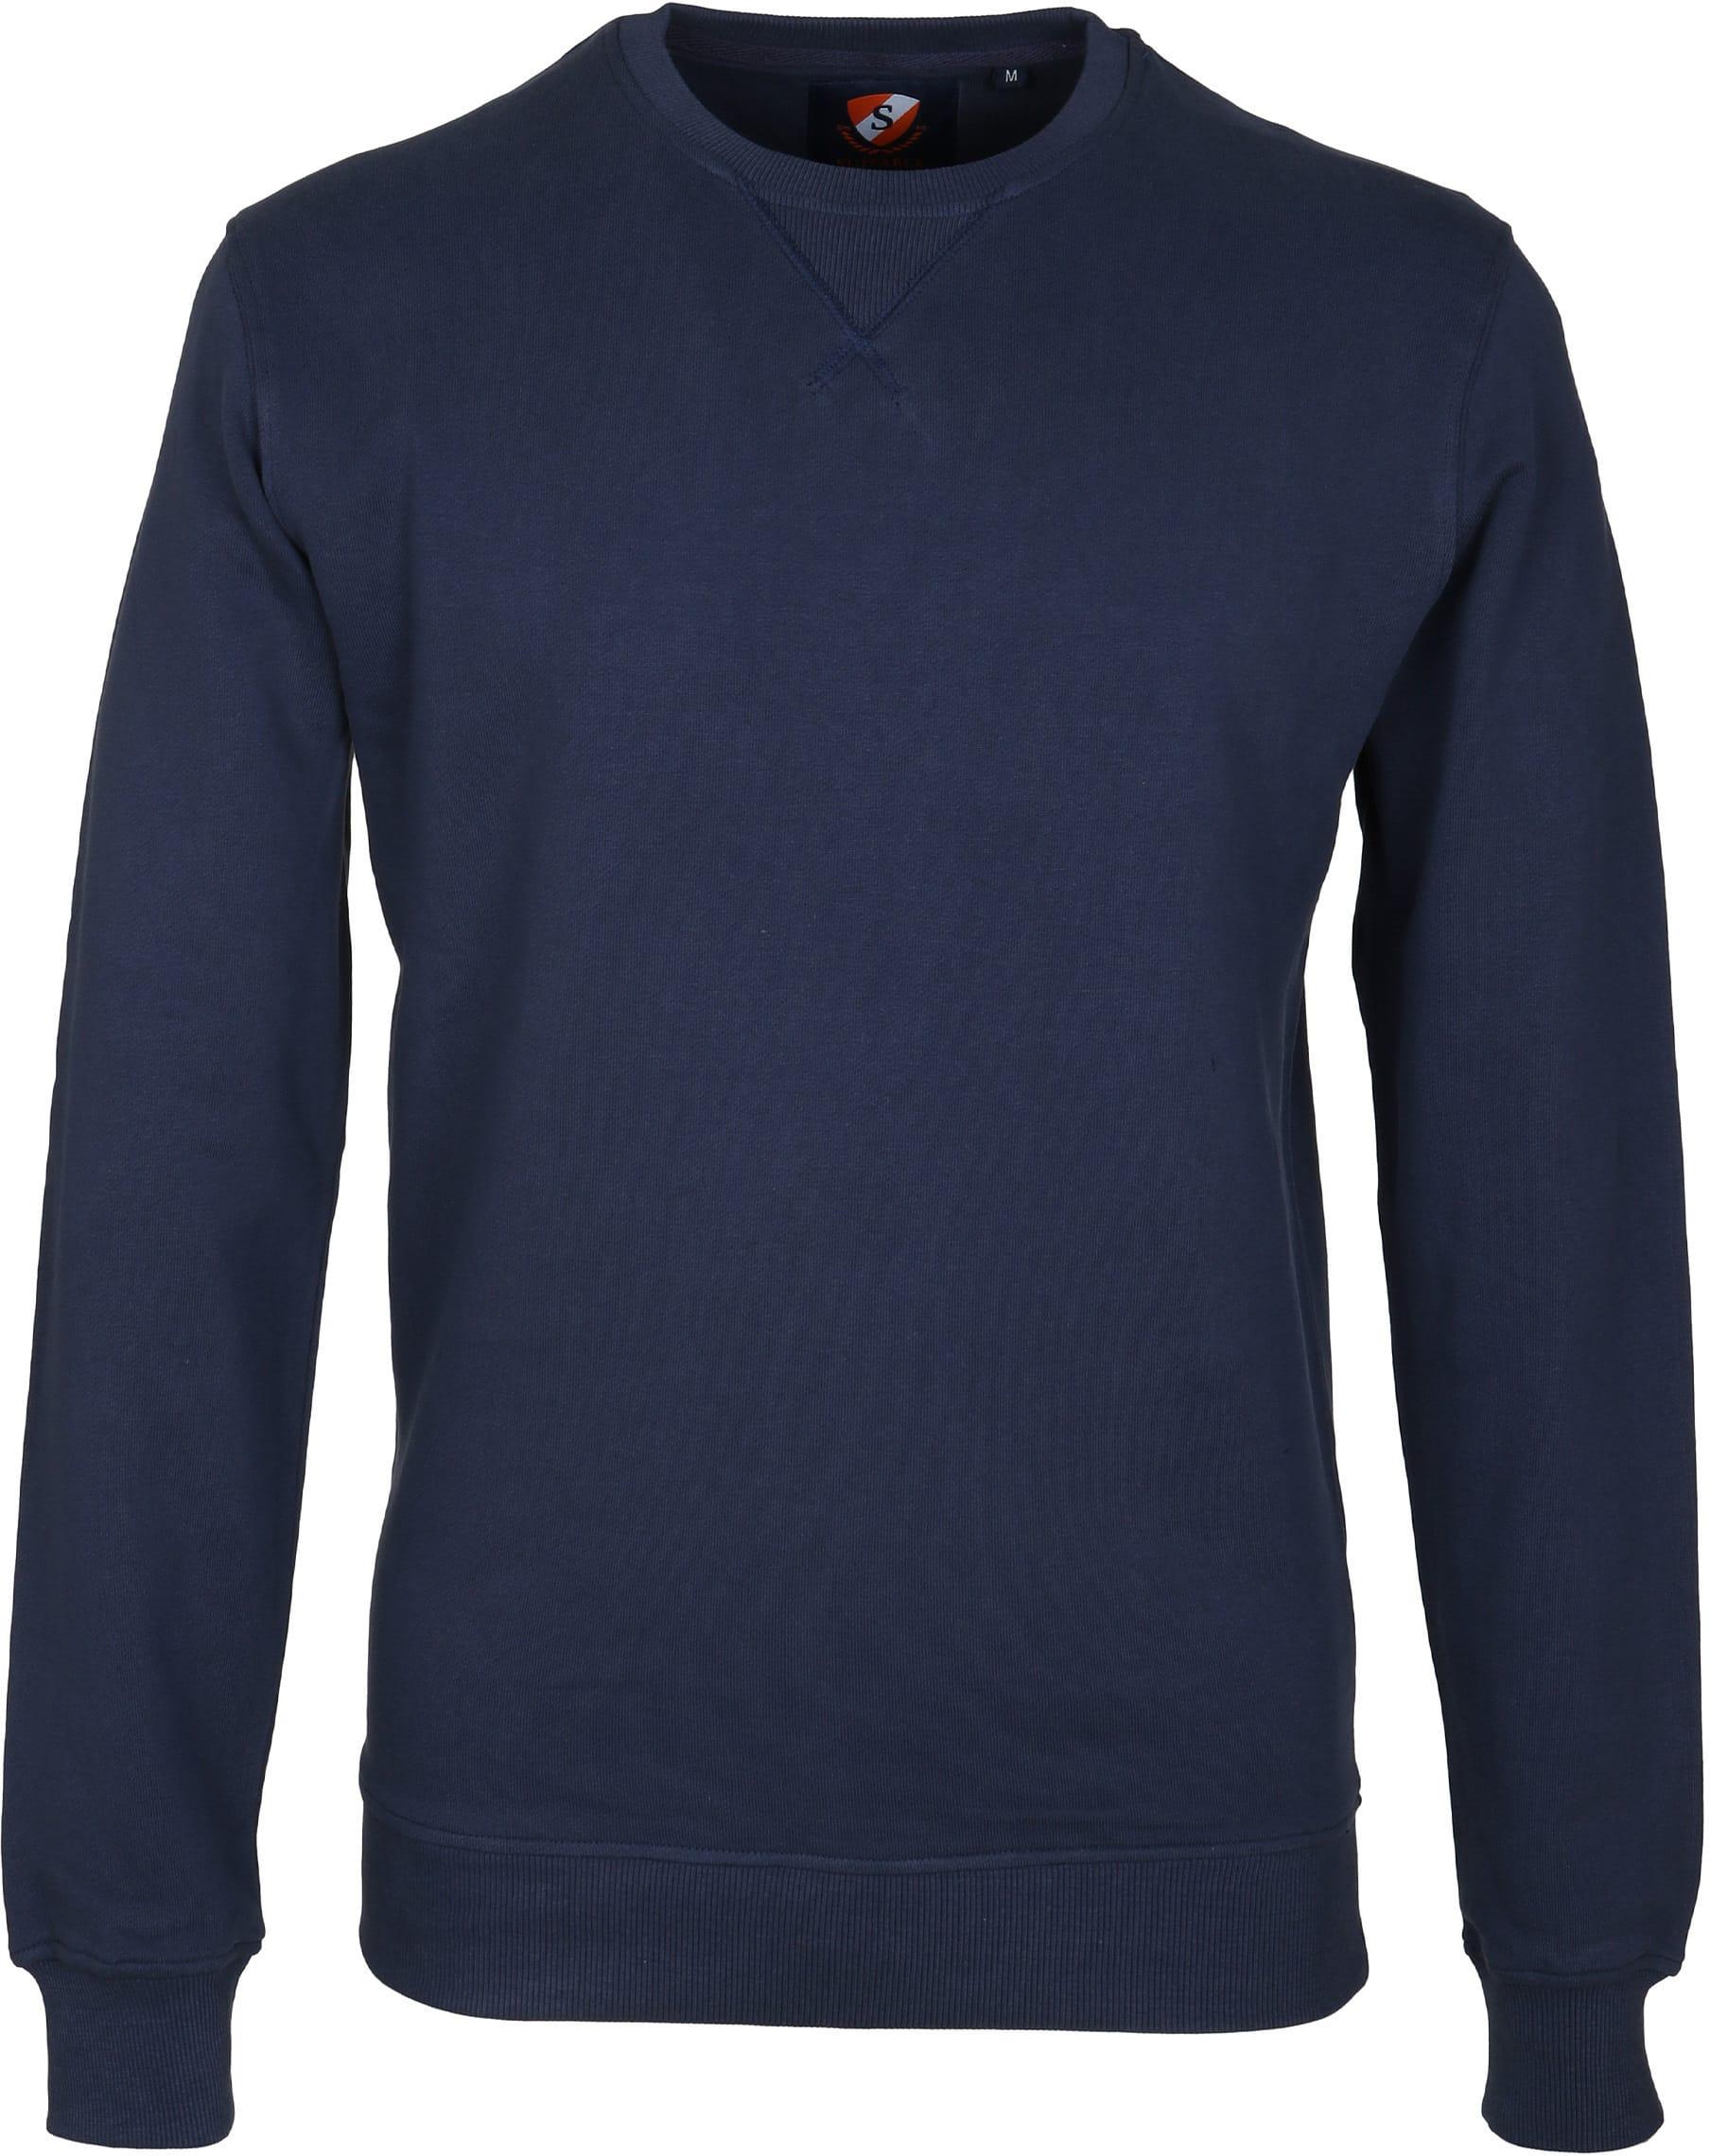 Suitable Sweater Uni Dunkelblau foto 0